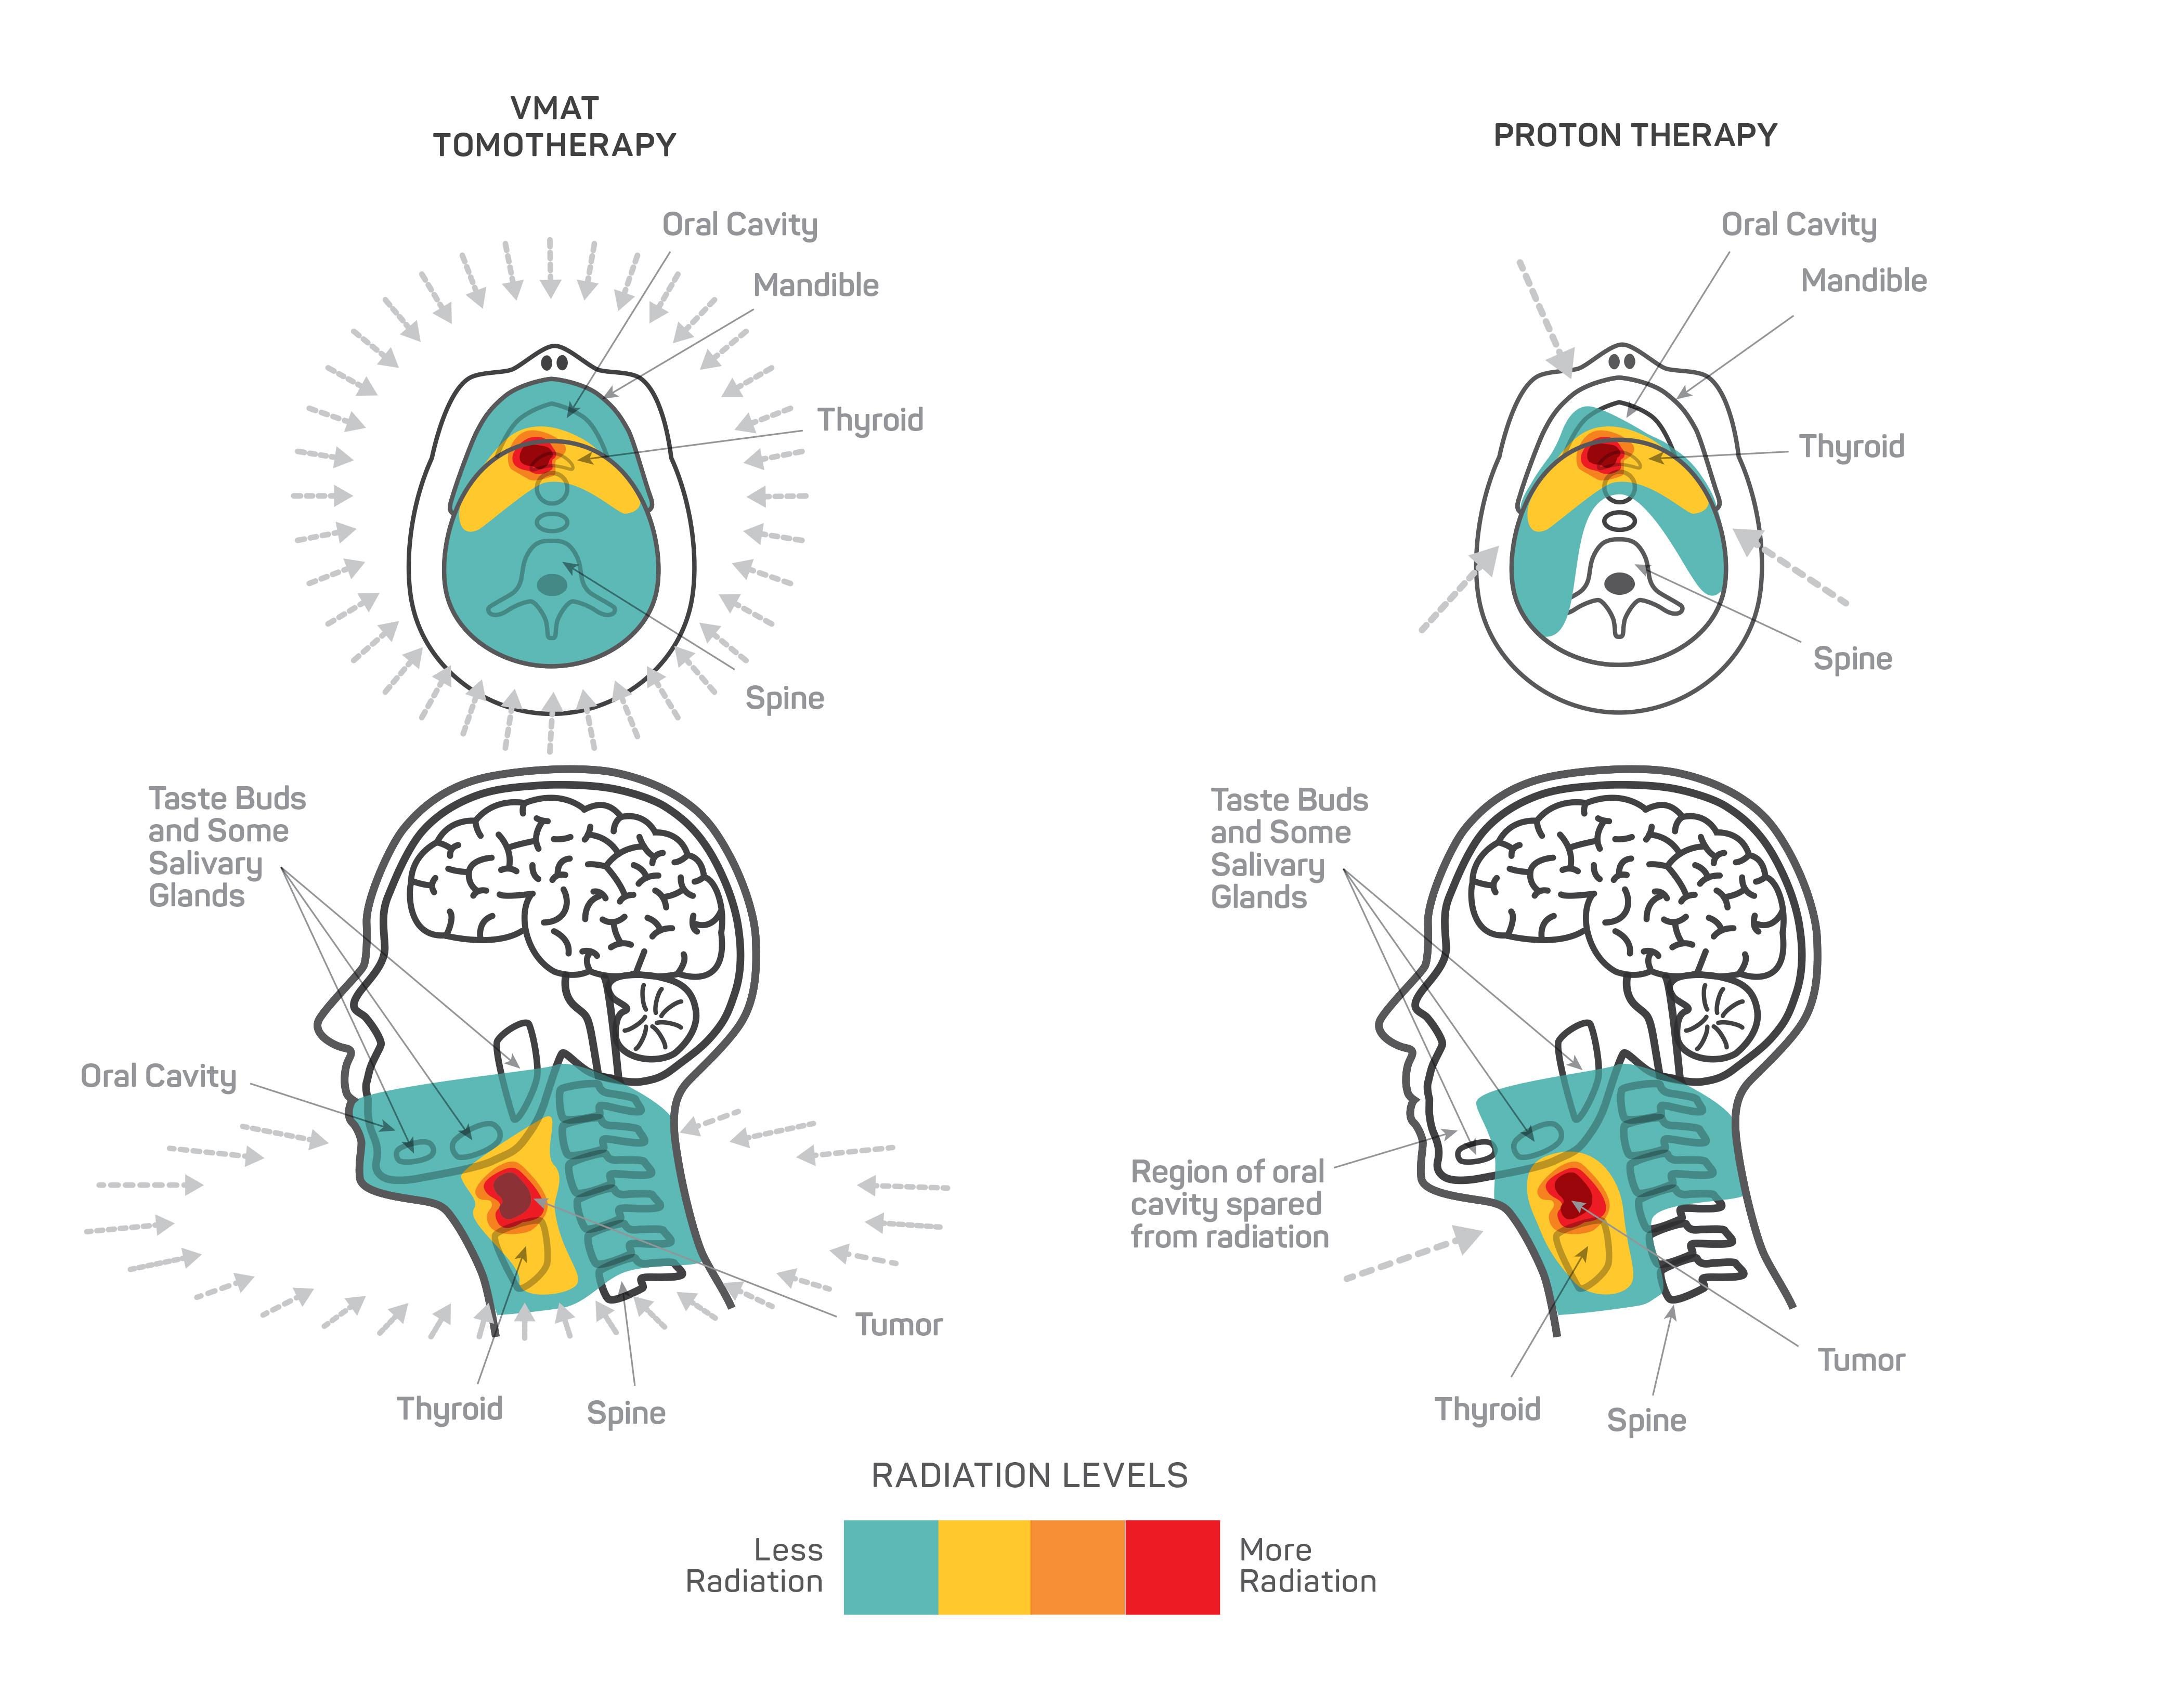 Radioterapia cáncer cabeza cuello